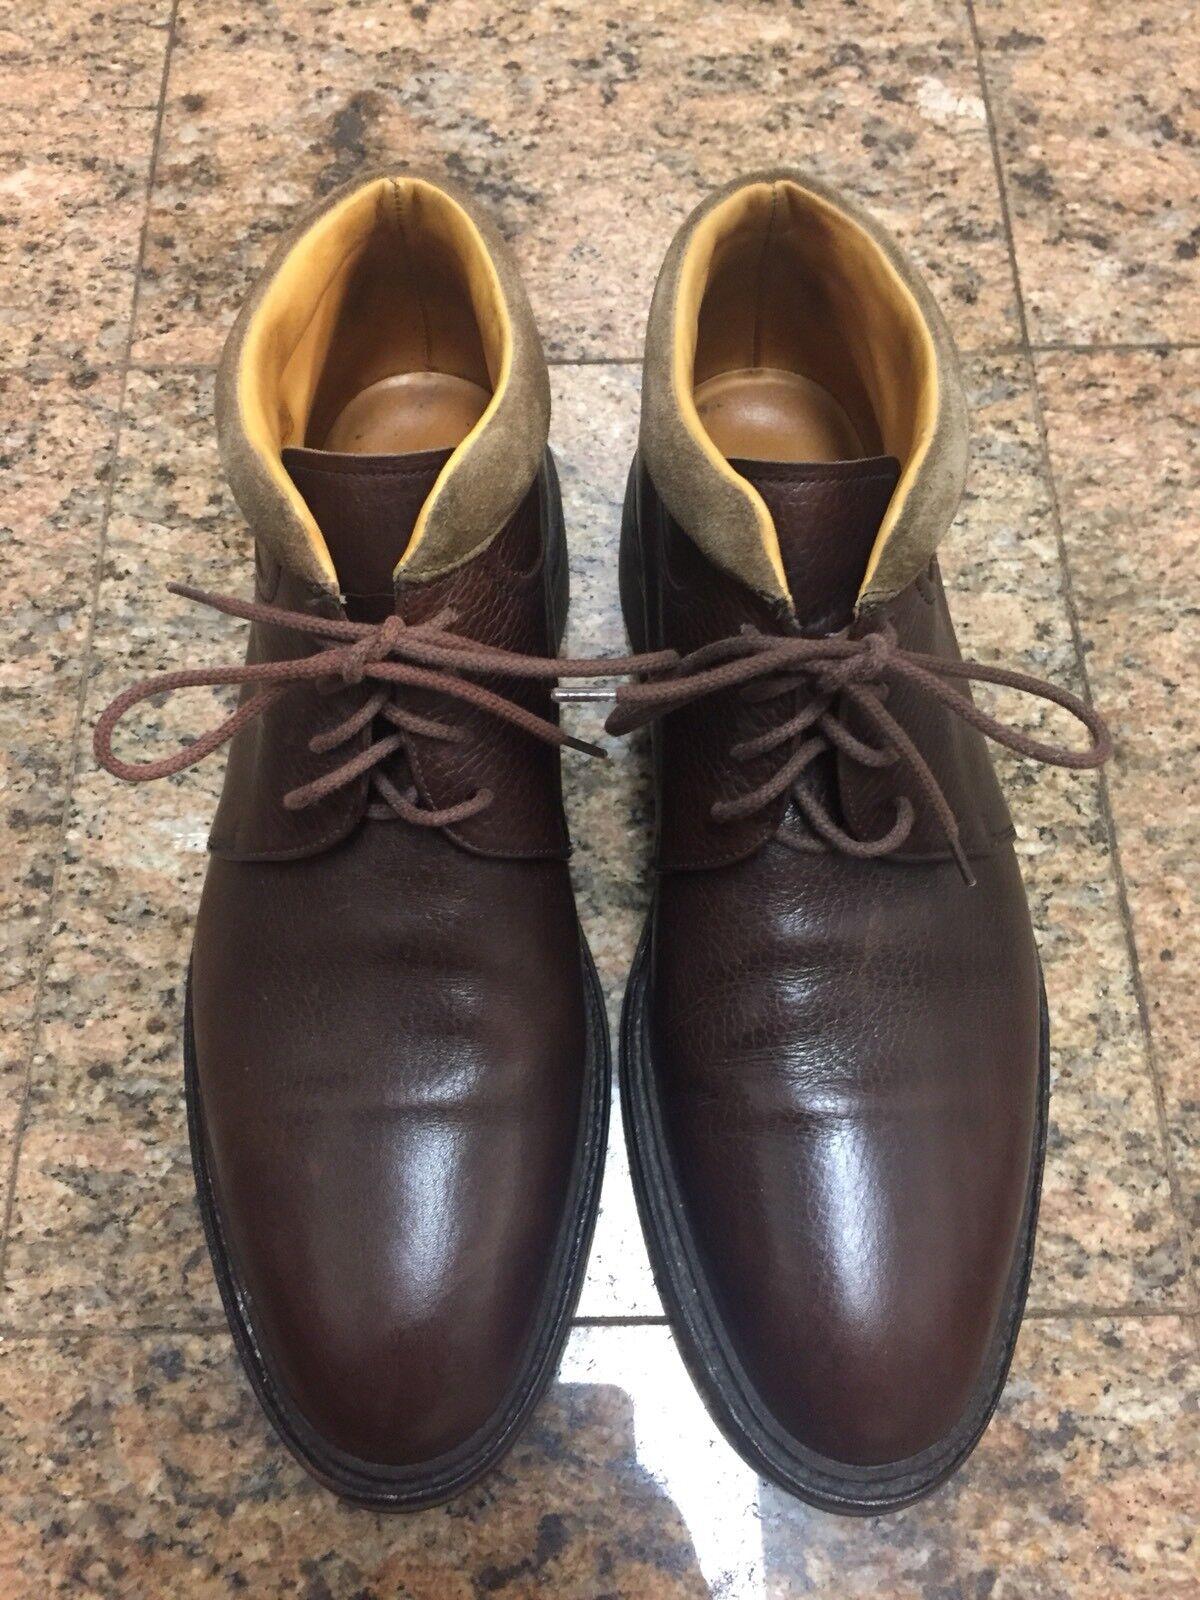 John Lobb Brown Pelle Shoes NWOT